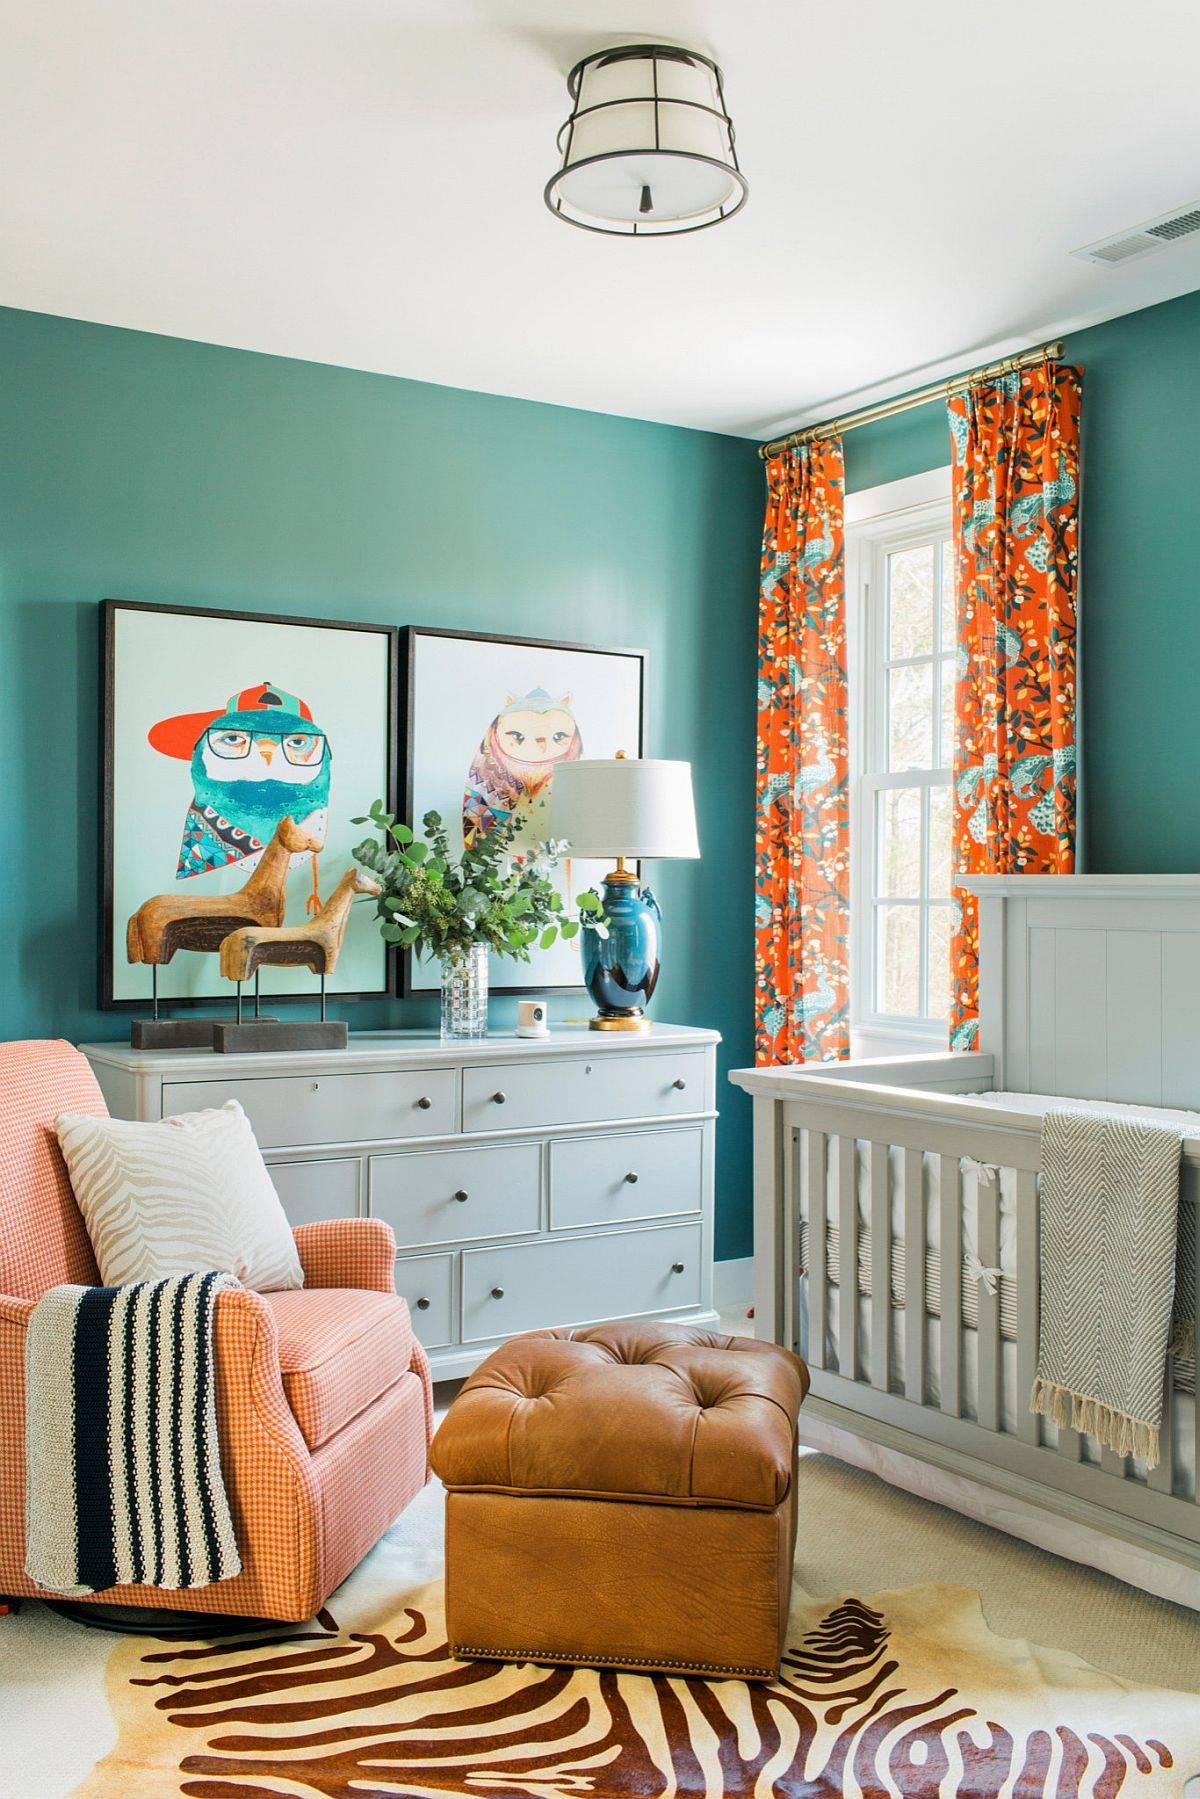 Gender-neutral nurseries can still be full of vibrant color